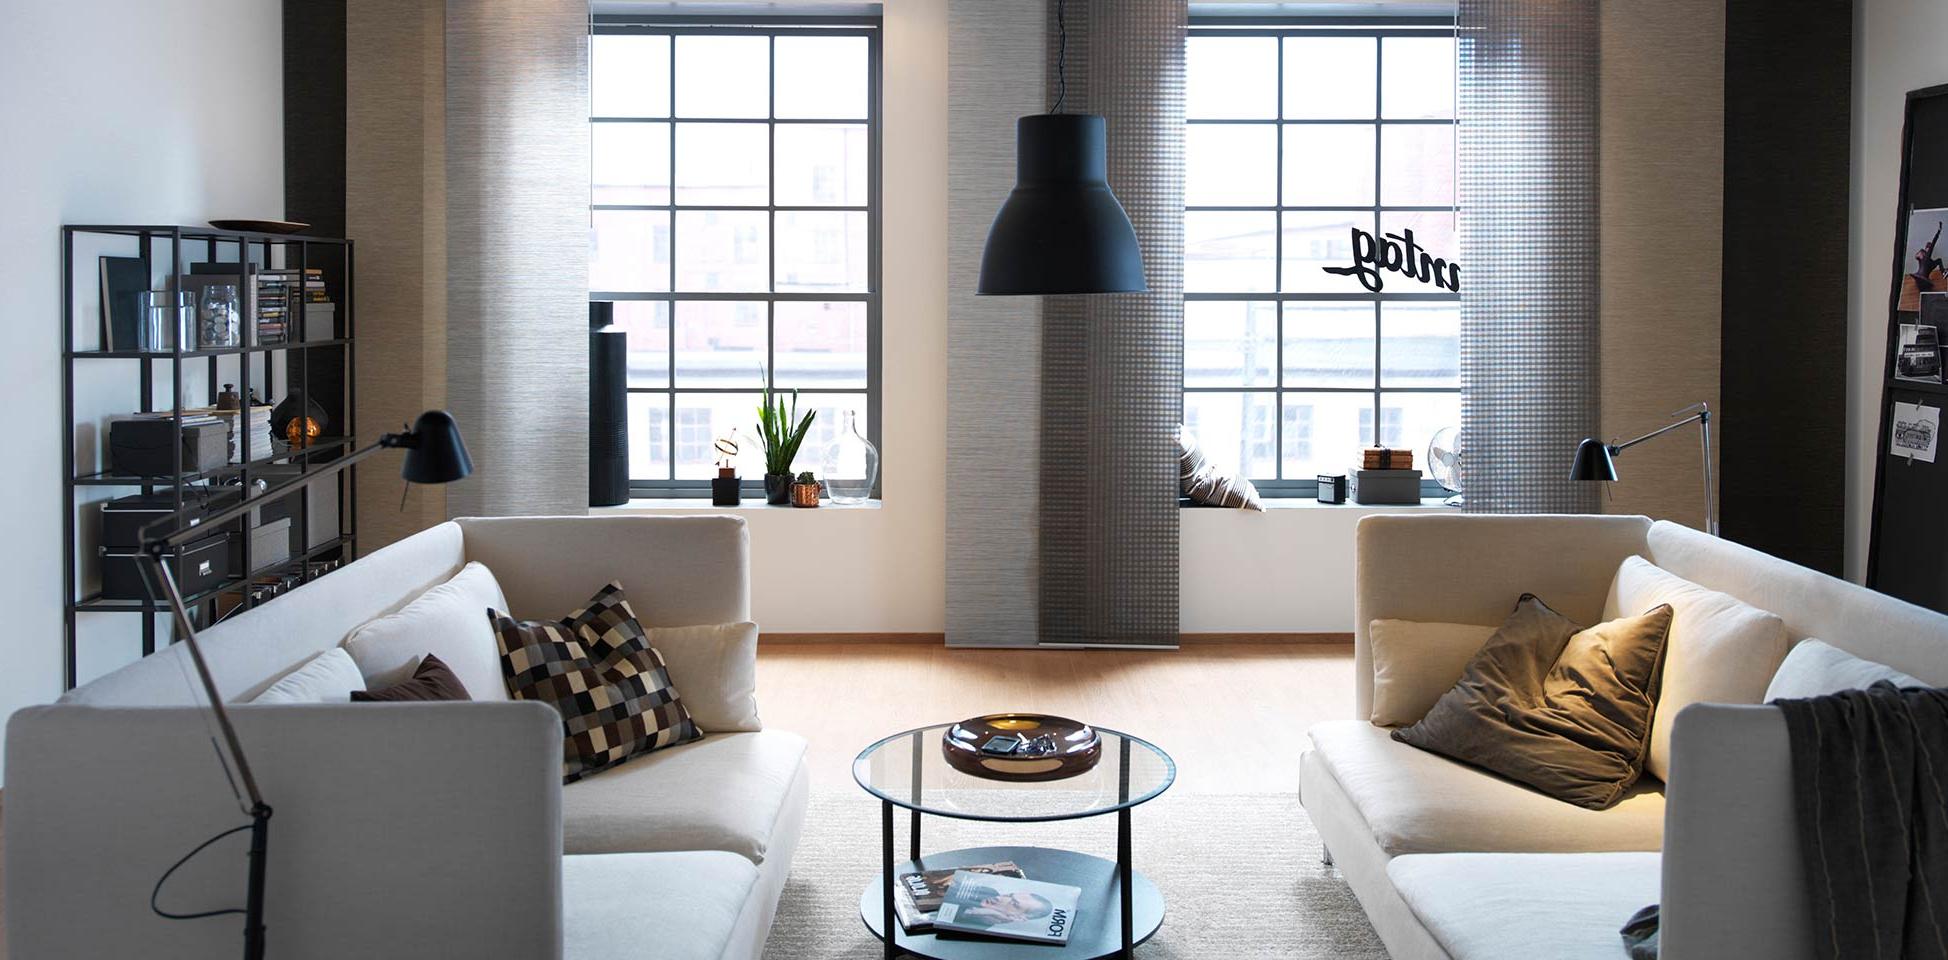 Bancos De Madera Para Interior De Ikea Wddj Curso Decora Tus Ventanas Con Cortinas Ikea